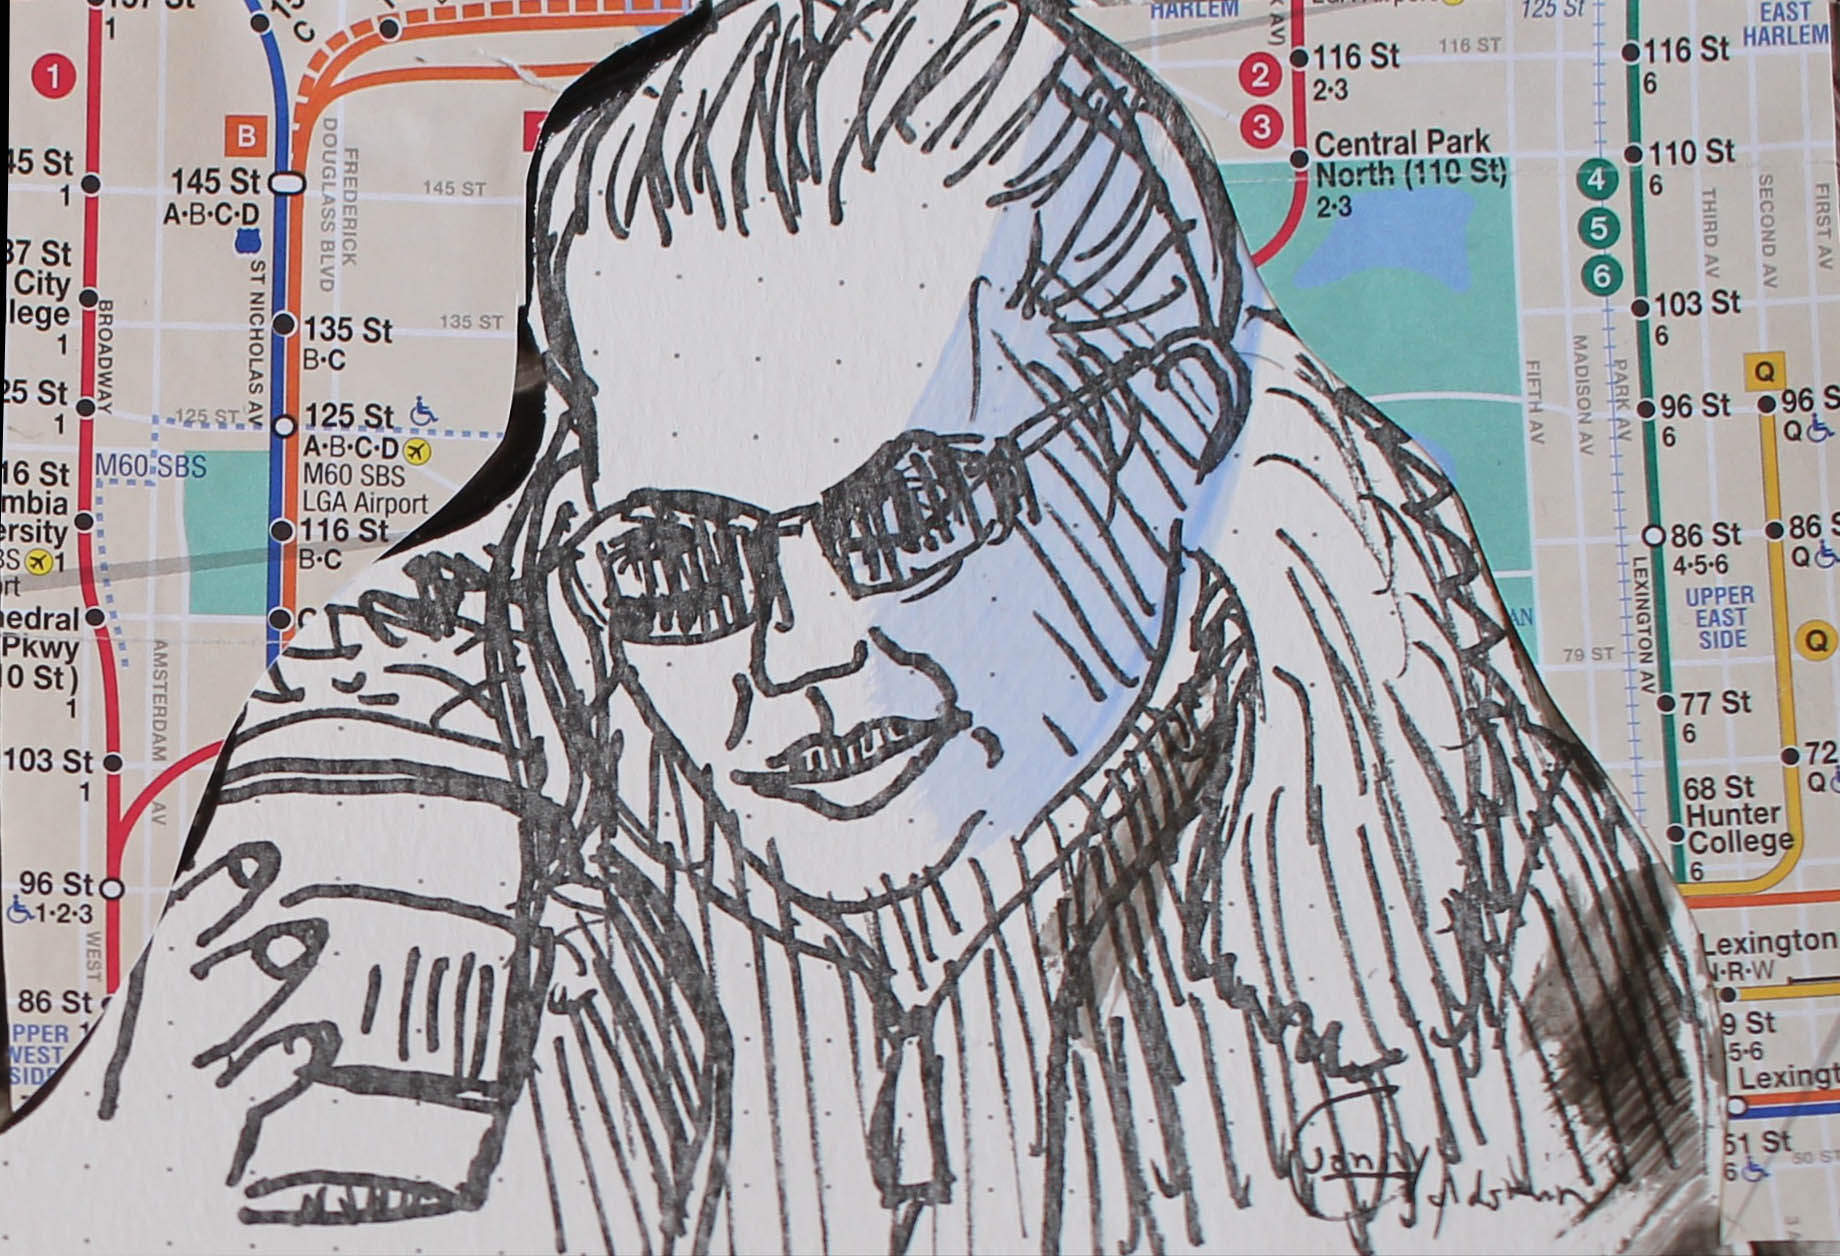 SubwaySeries-BrunetteSunglassesWoman.jpg